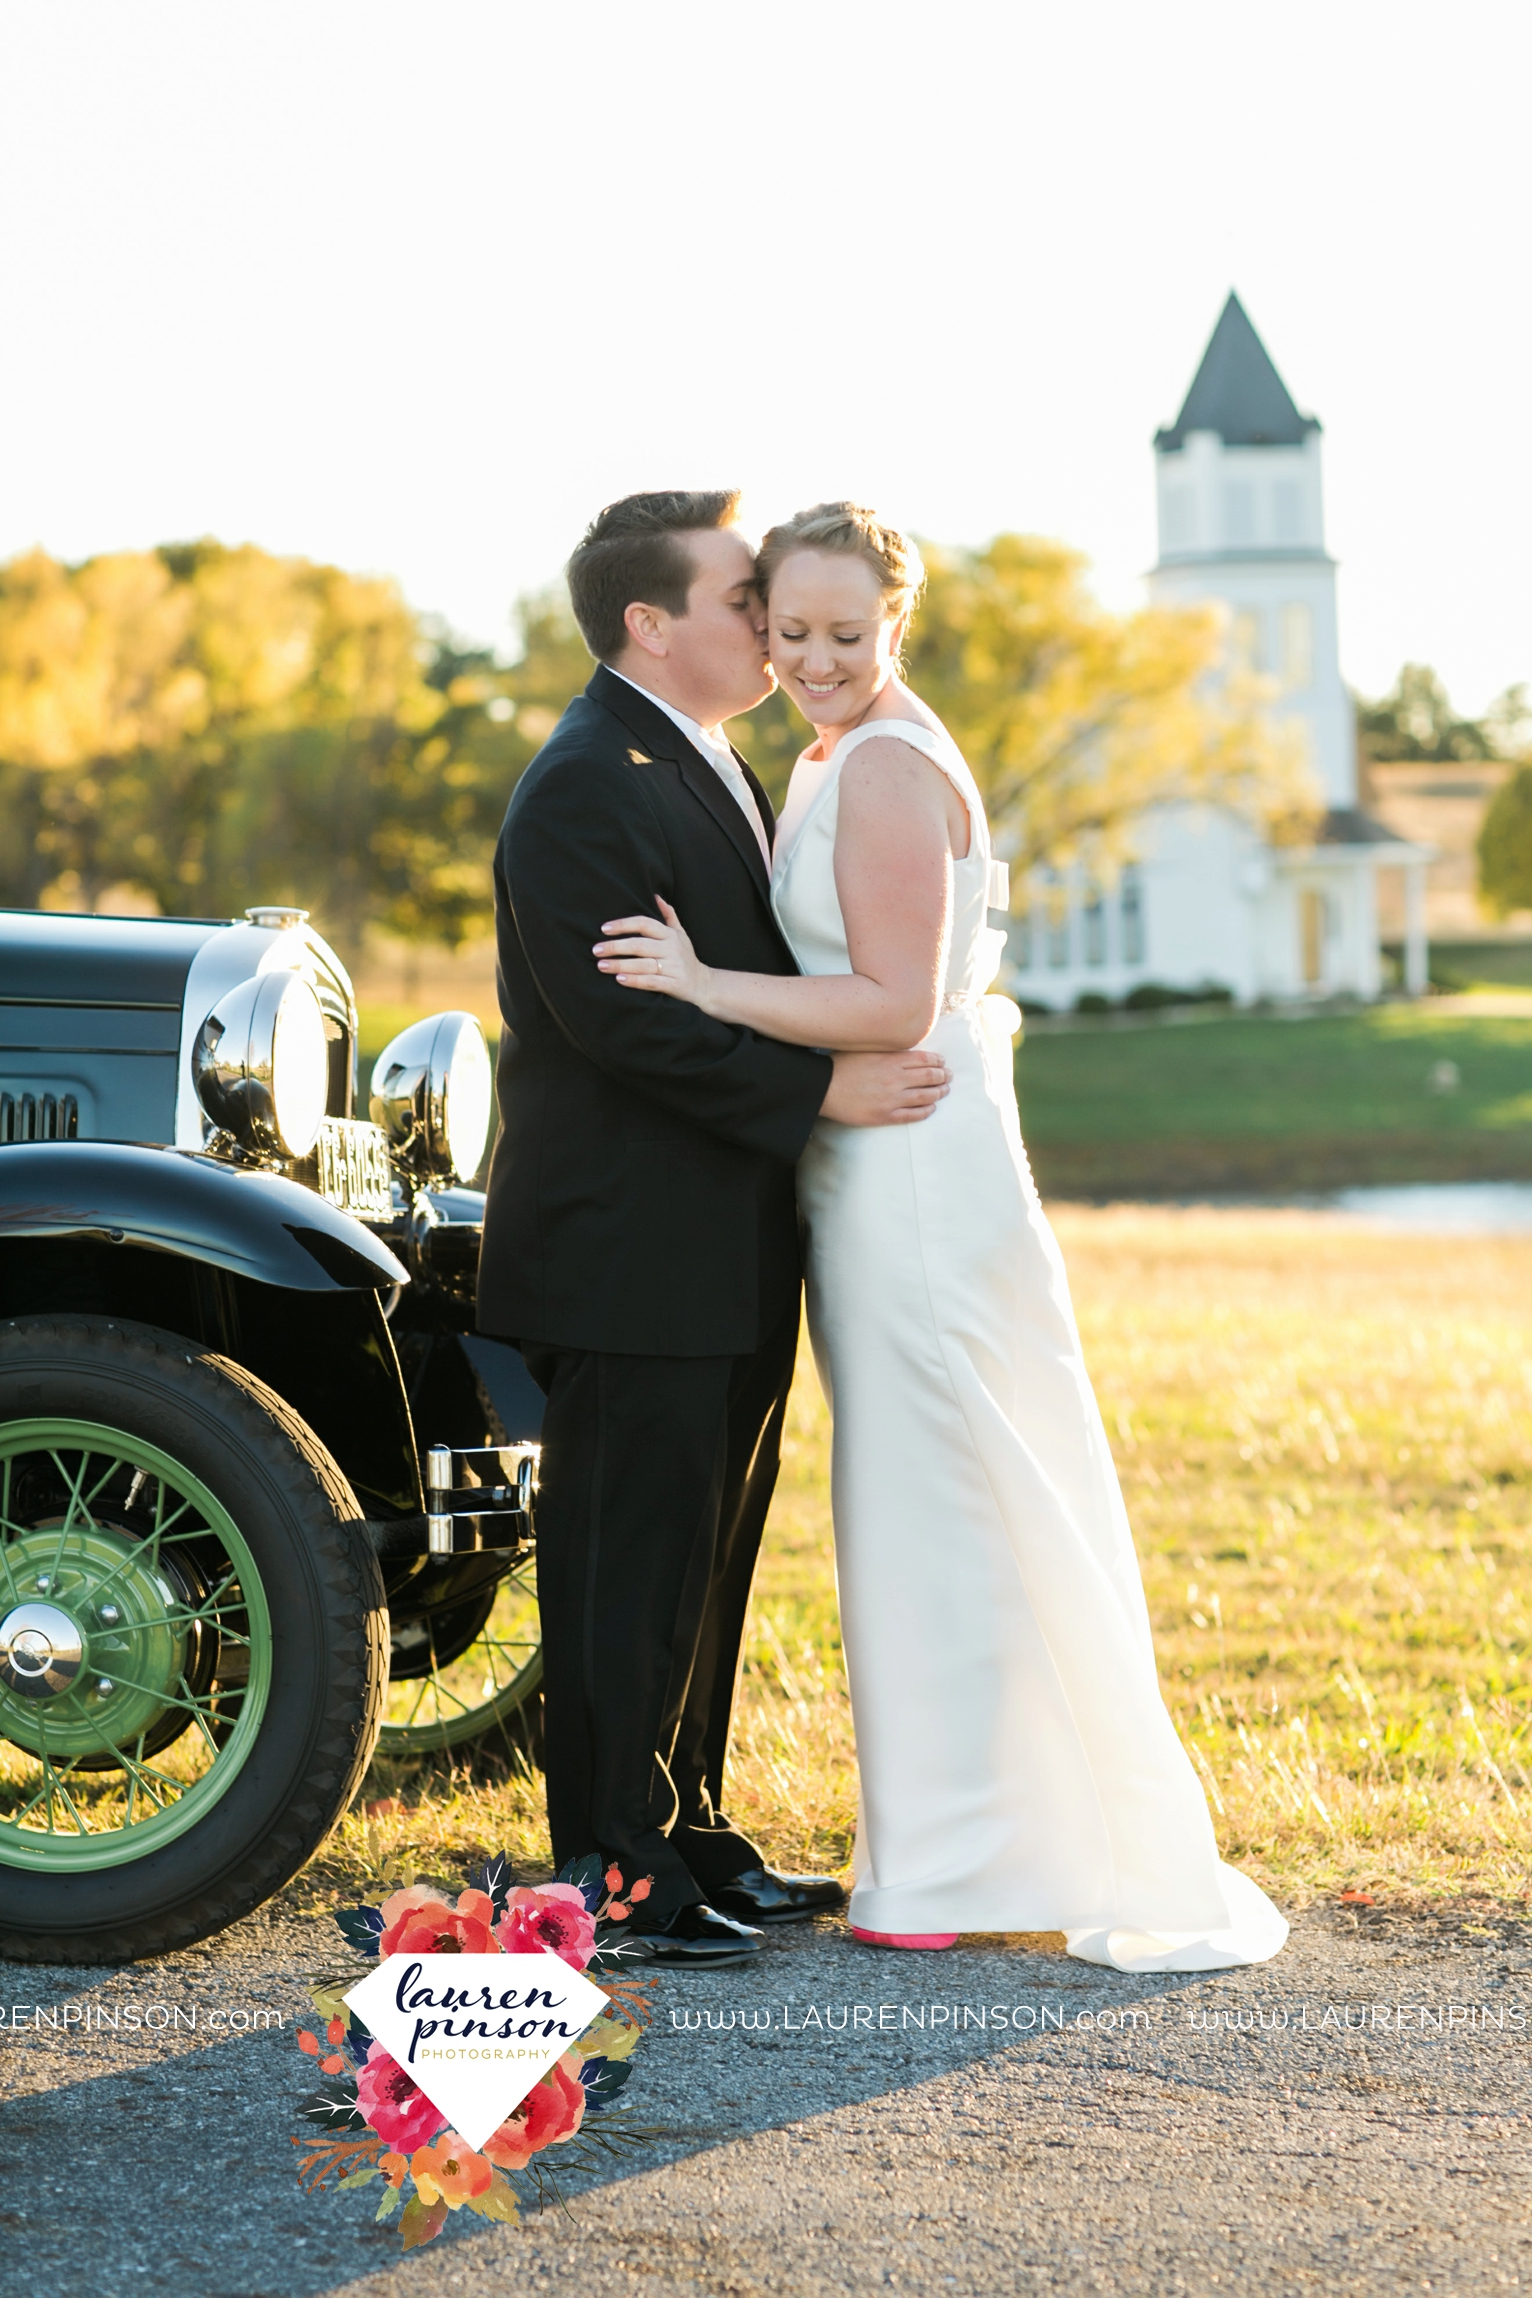 bells-texas-wedding-photography-at-willowood-ranch-chapel-north-texas-wichita-falls-wedding-photographer_1851.jpg